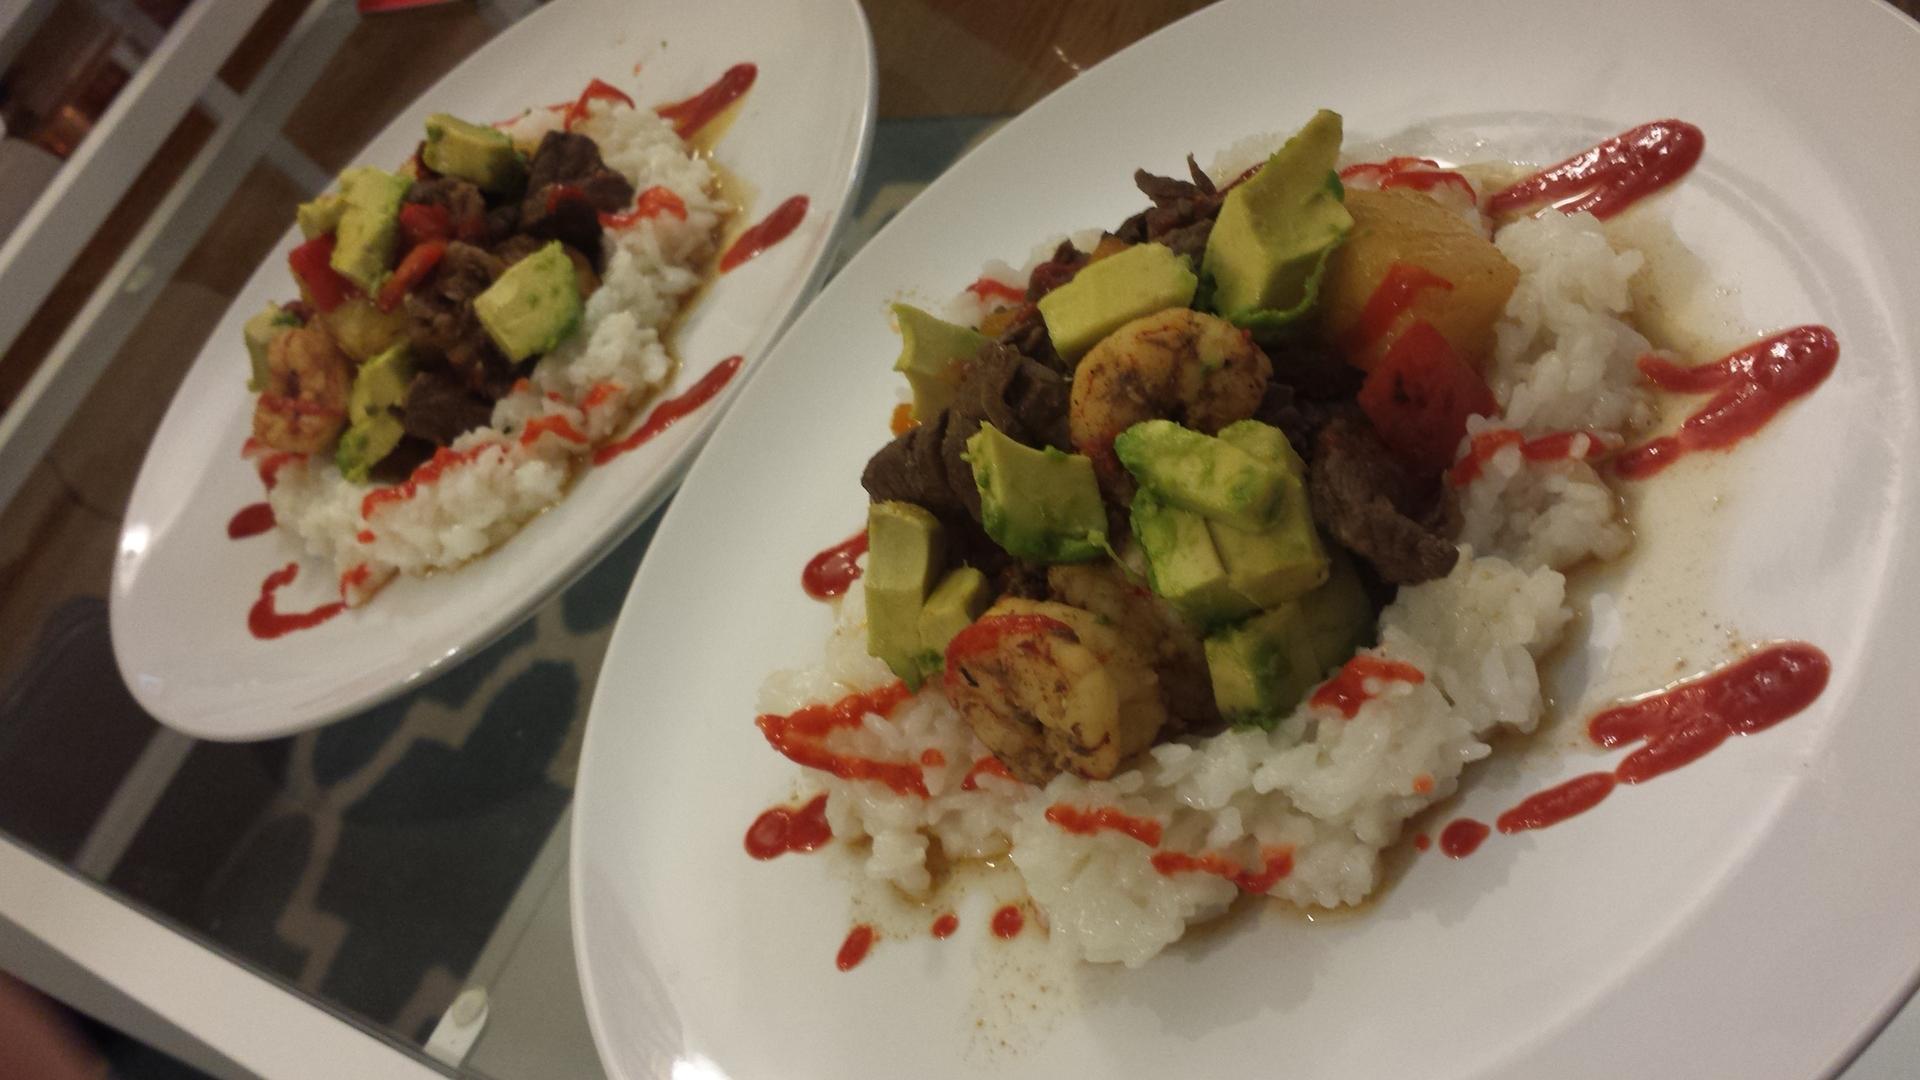 Food, Rice, Vegetable, Dinner, Meal